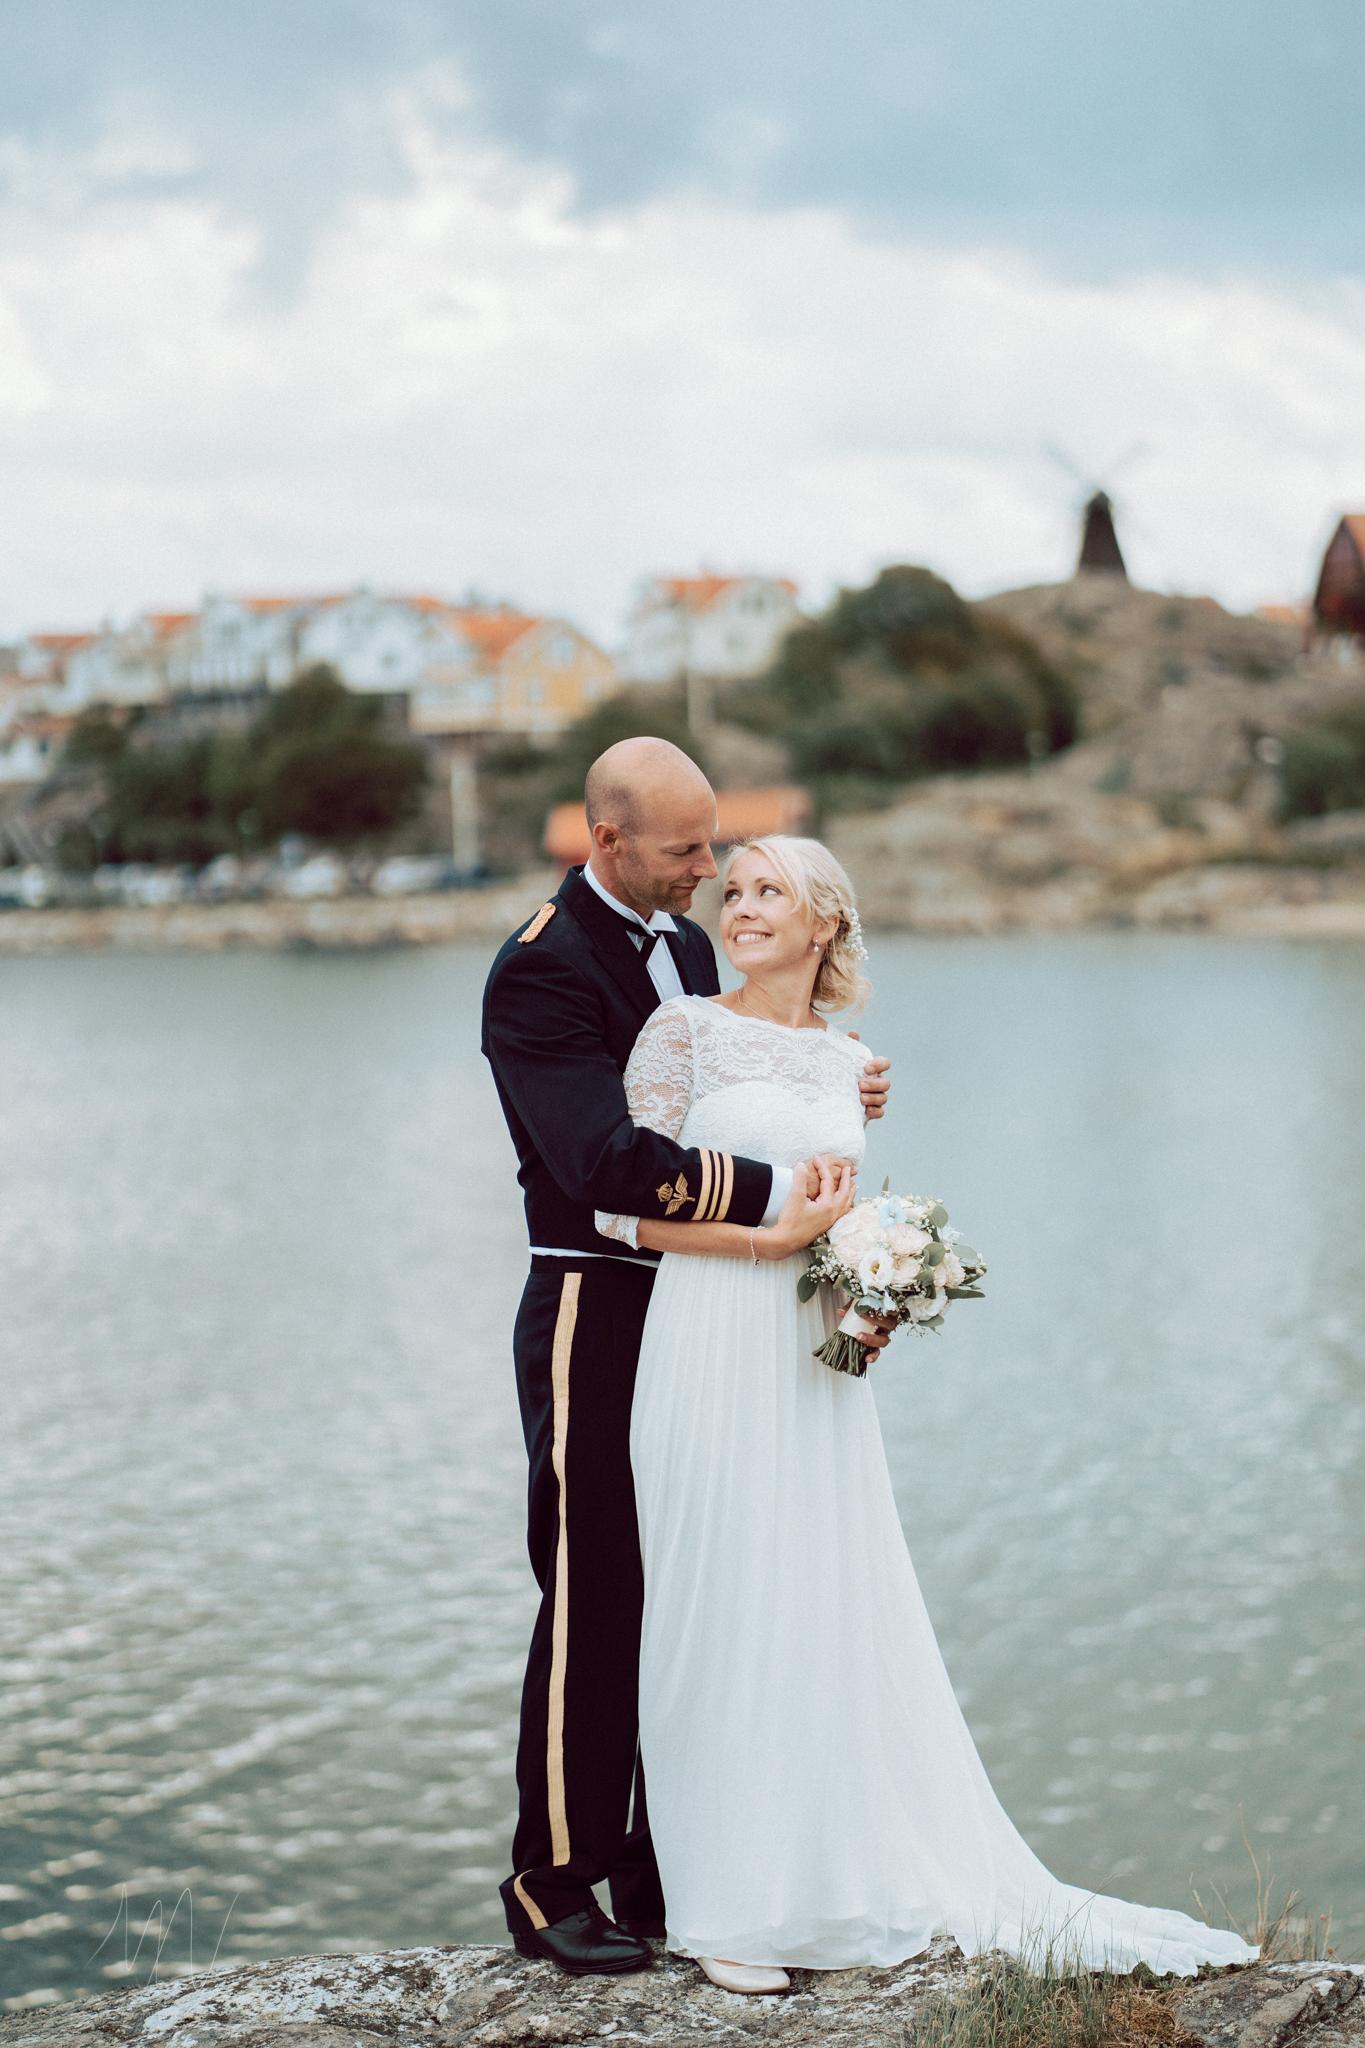 Bröllop-fotografmaxnorin.se-MariaMarcus-390.JPG